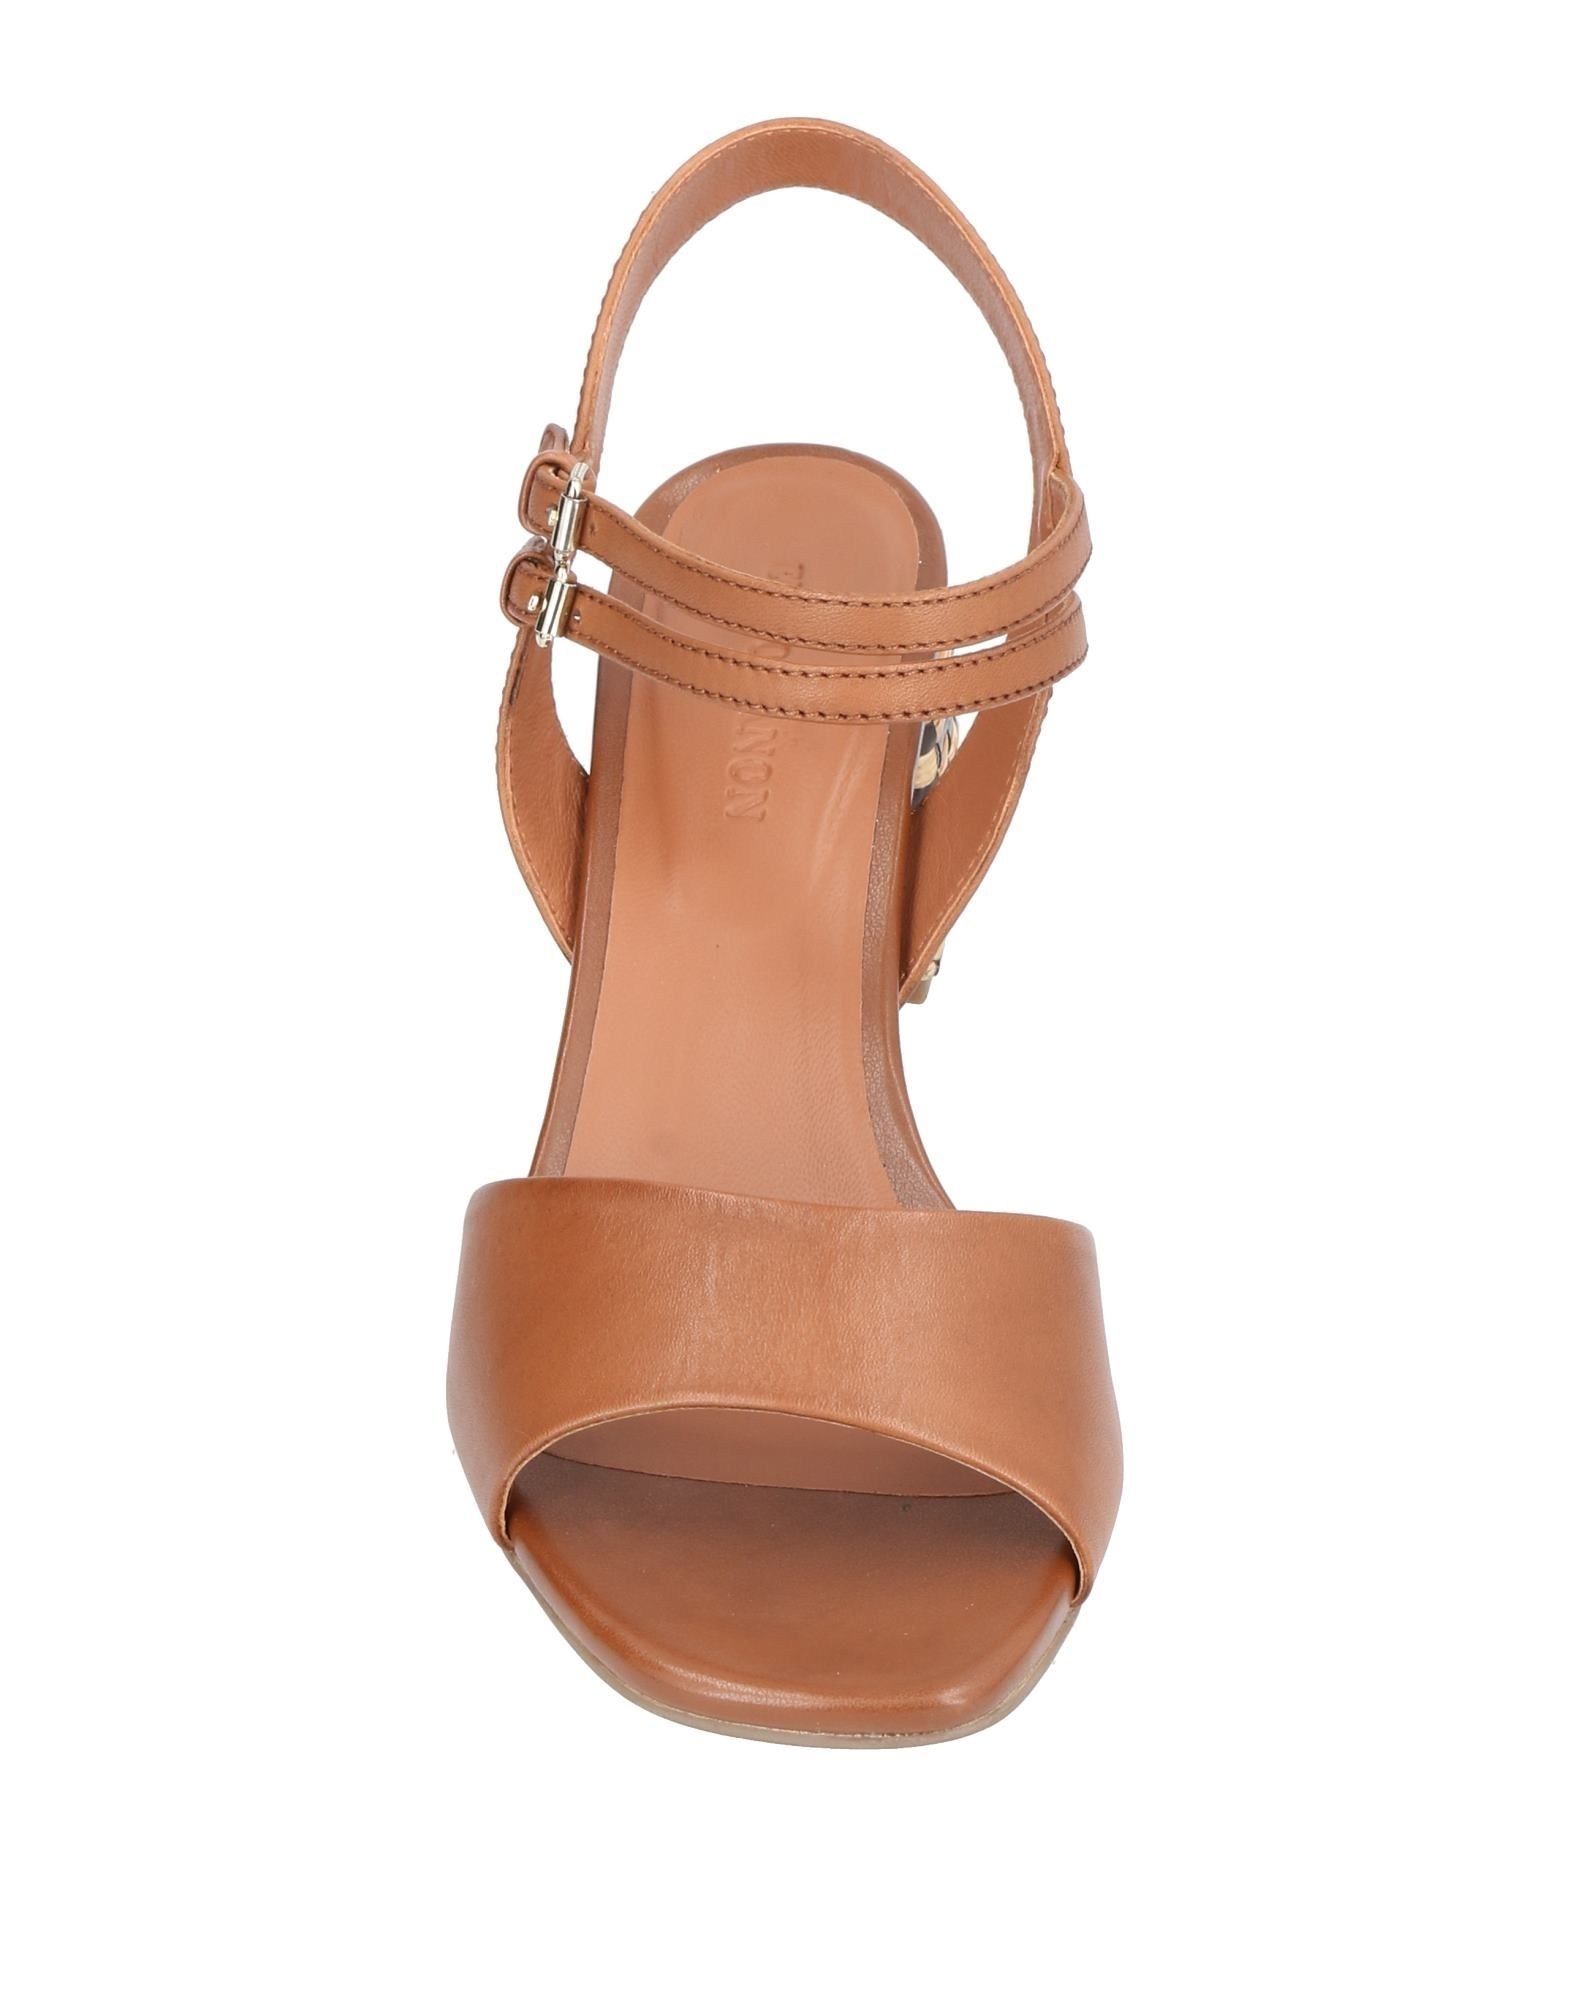 Elvio Zanon Sandalen Damen 11456089SX  11456089SX Damen Gute Qualität beliebte Schuhe ec6e07